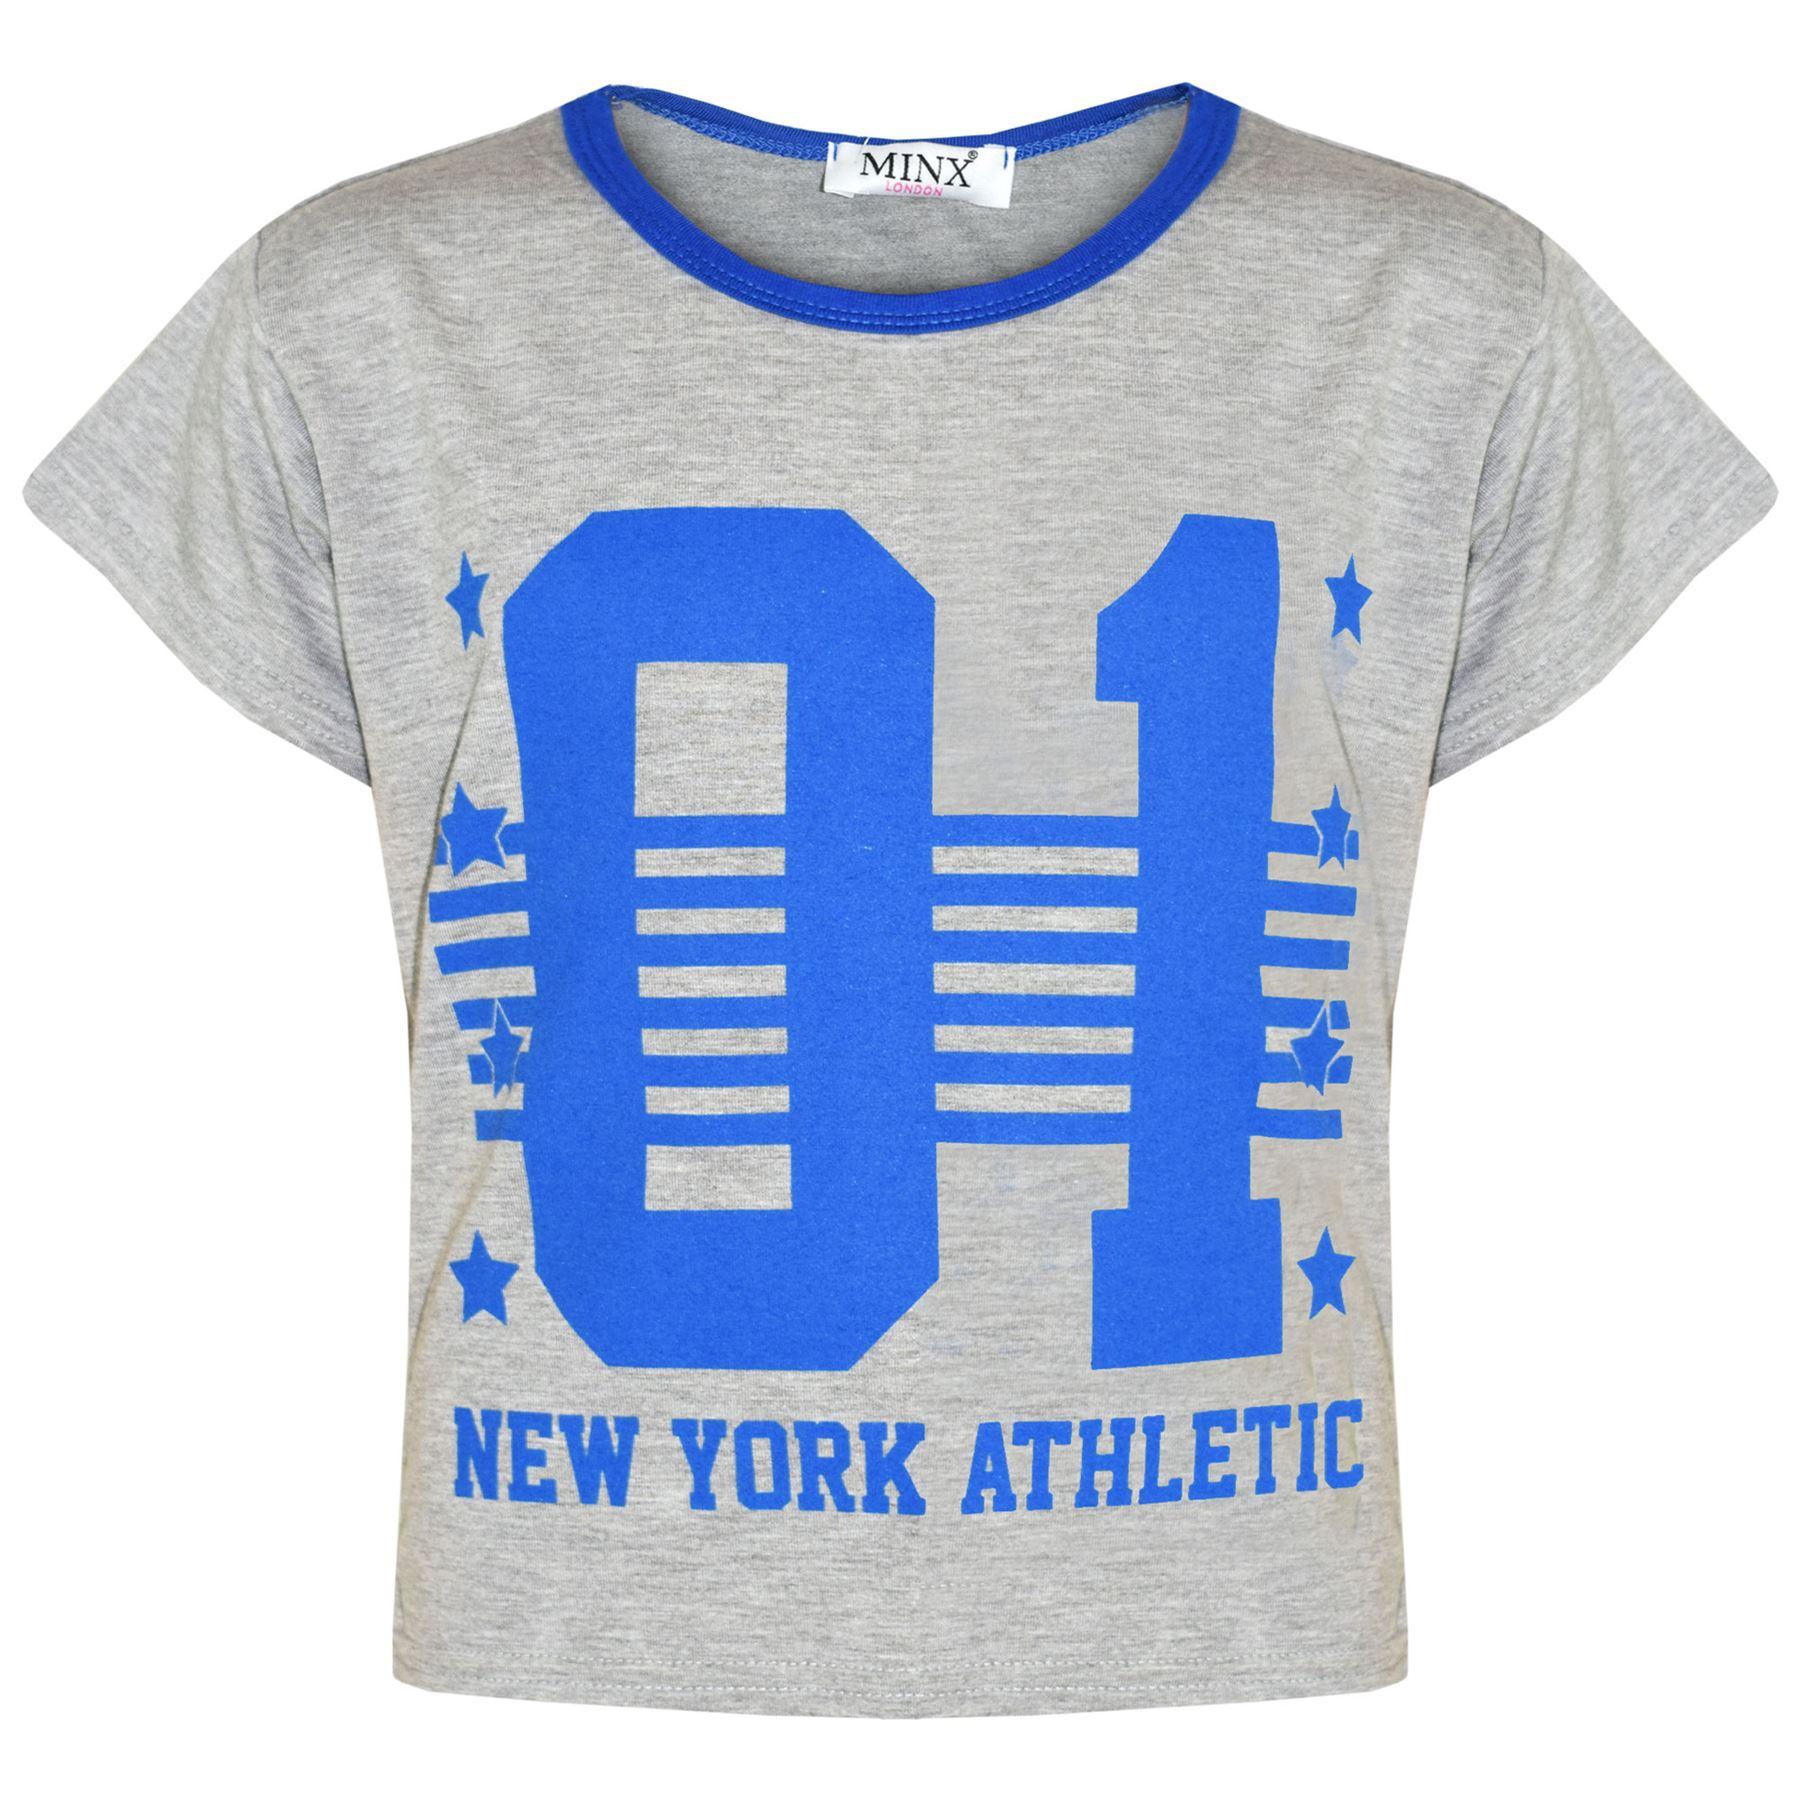 Girls Tops Kids 01 New York Athletic Print Stylish Crop Top Legging Set 7-13 Yrs